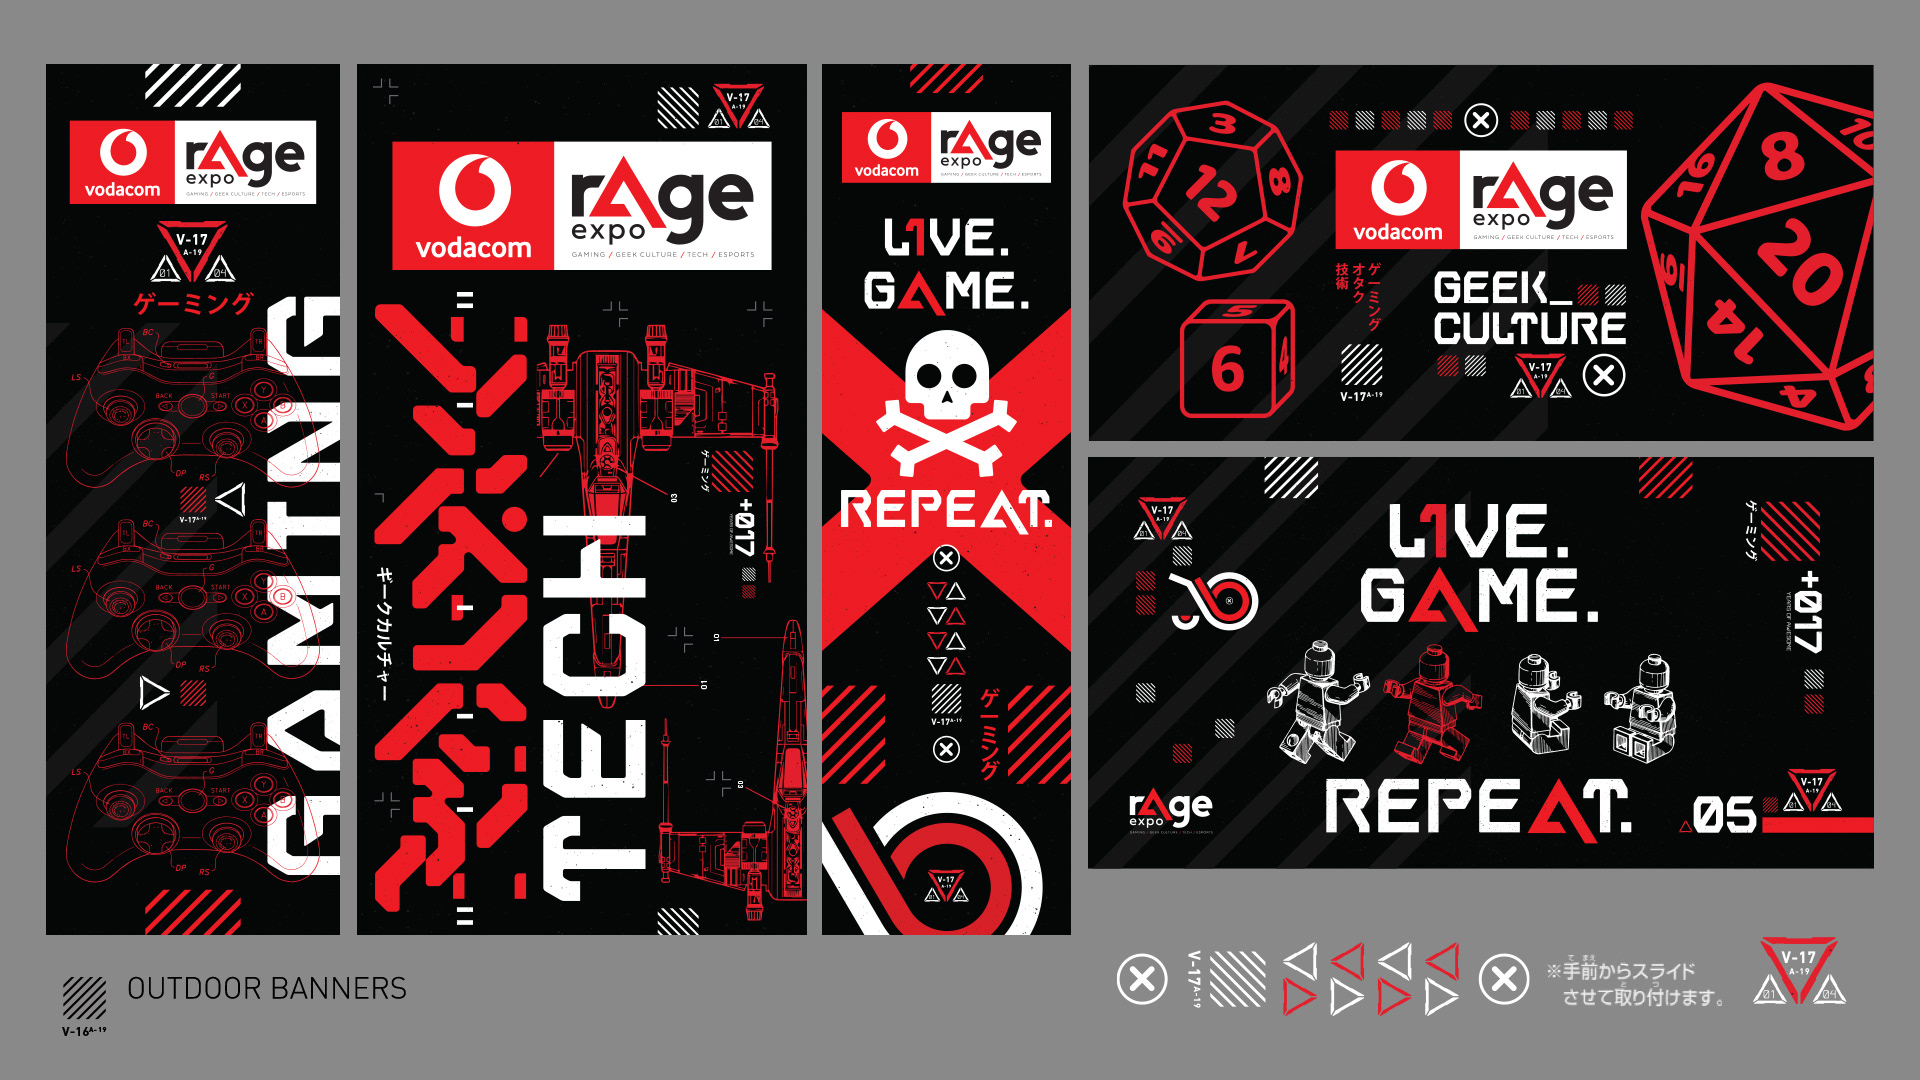 rAge expo 2019 outdoor banner designs